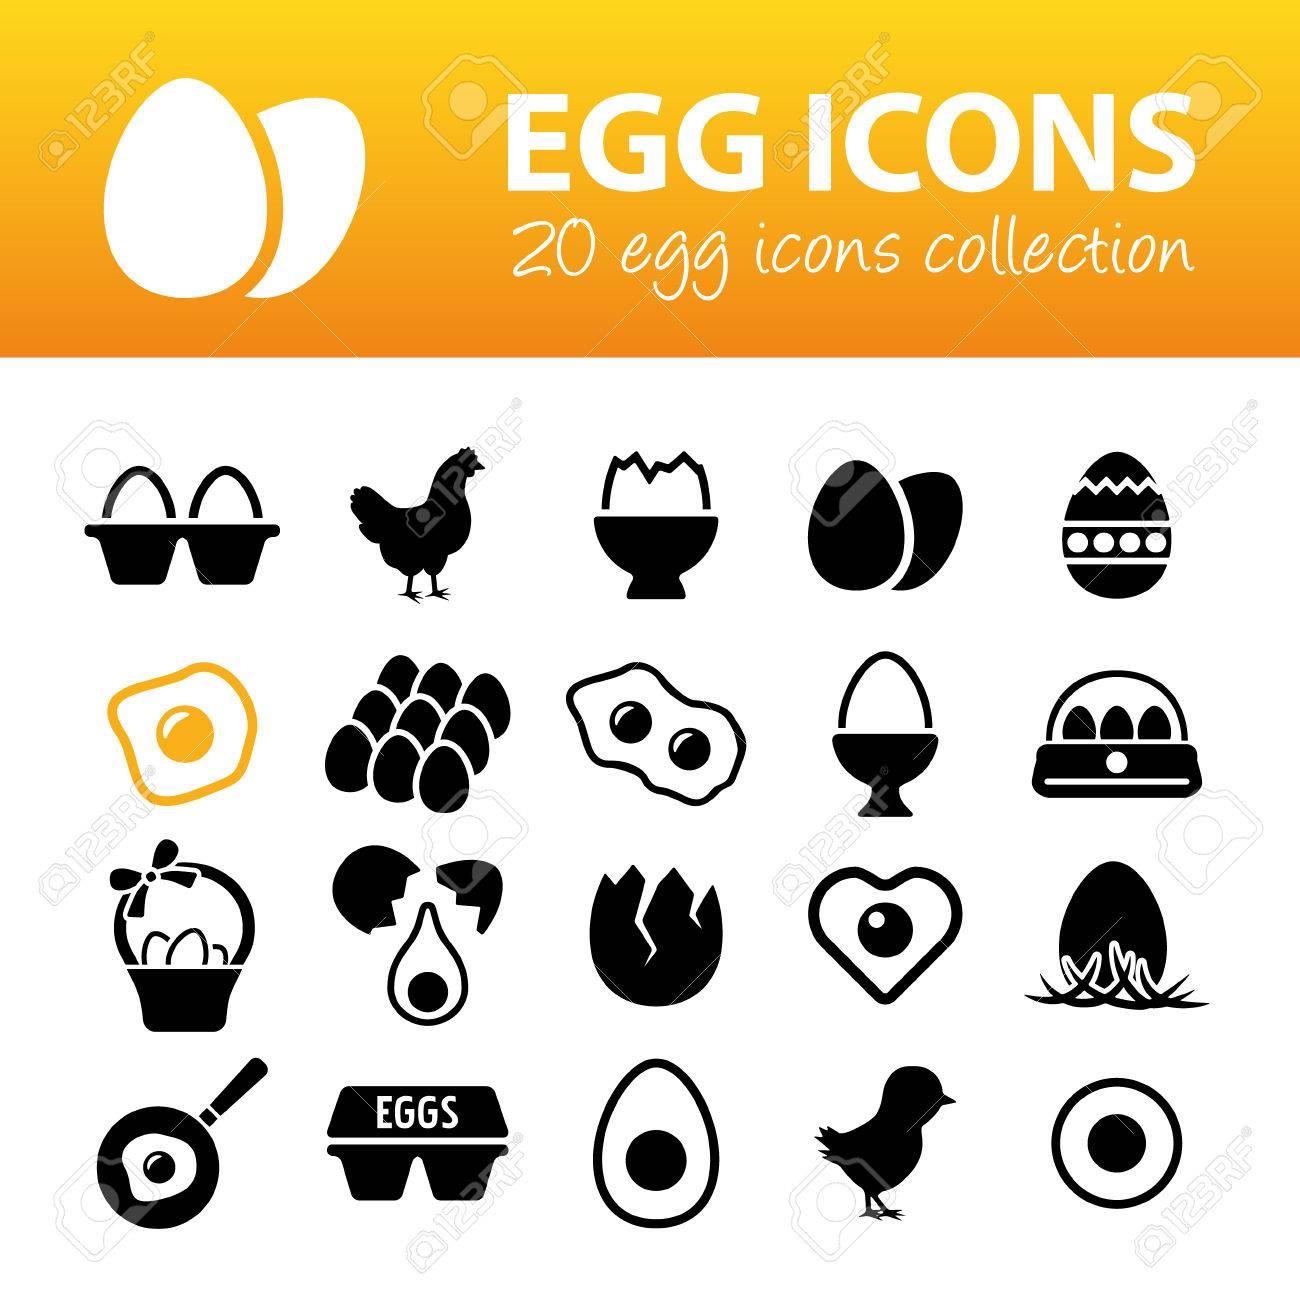 egg icons - 38957837